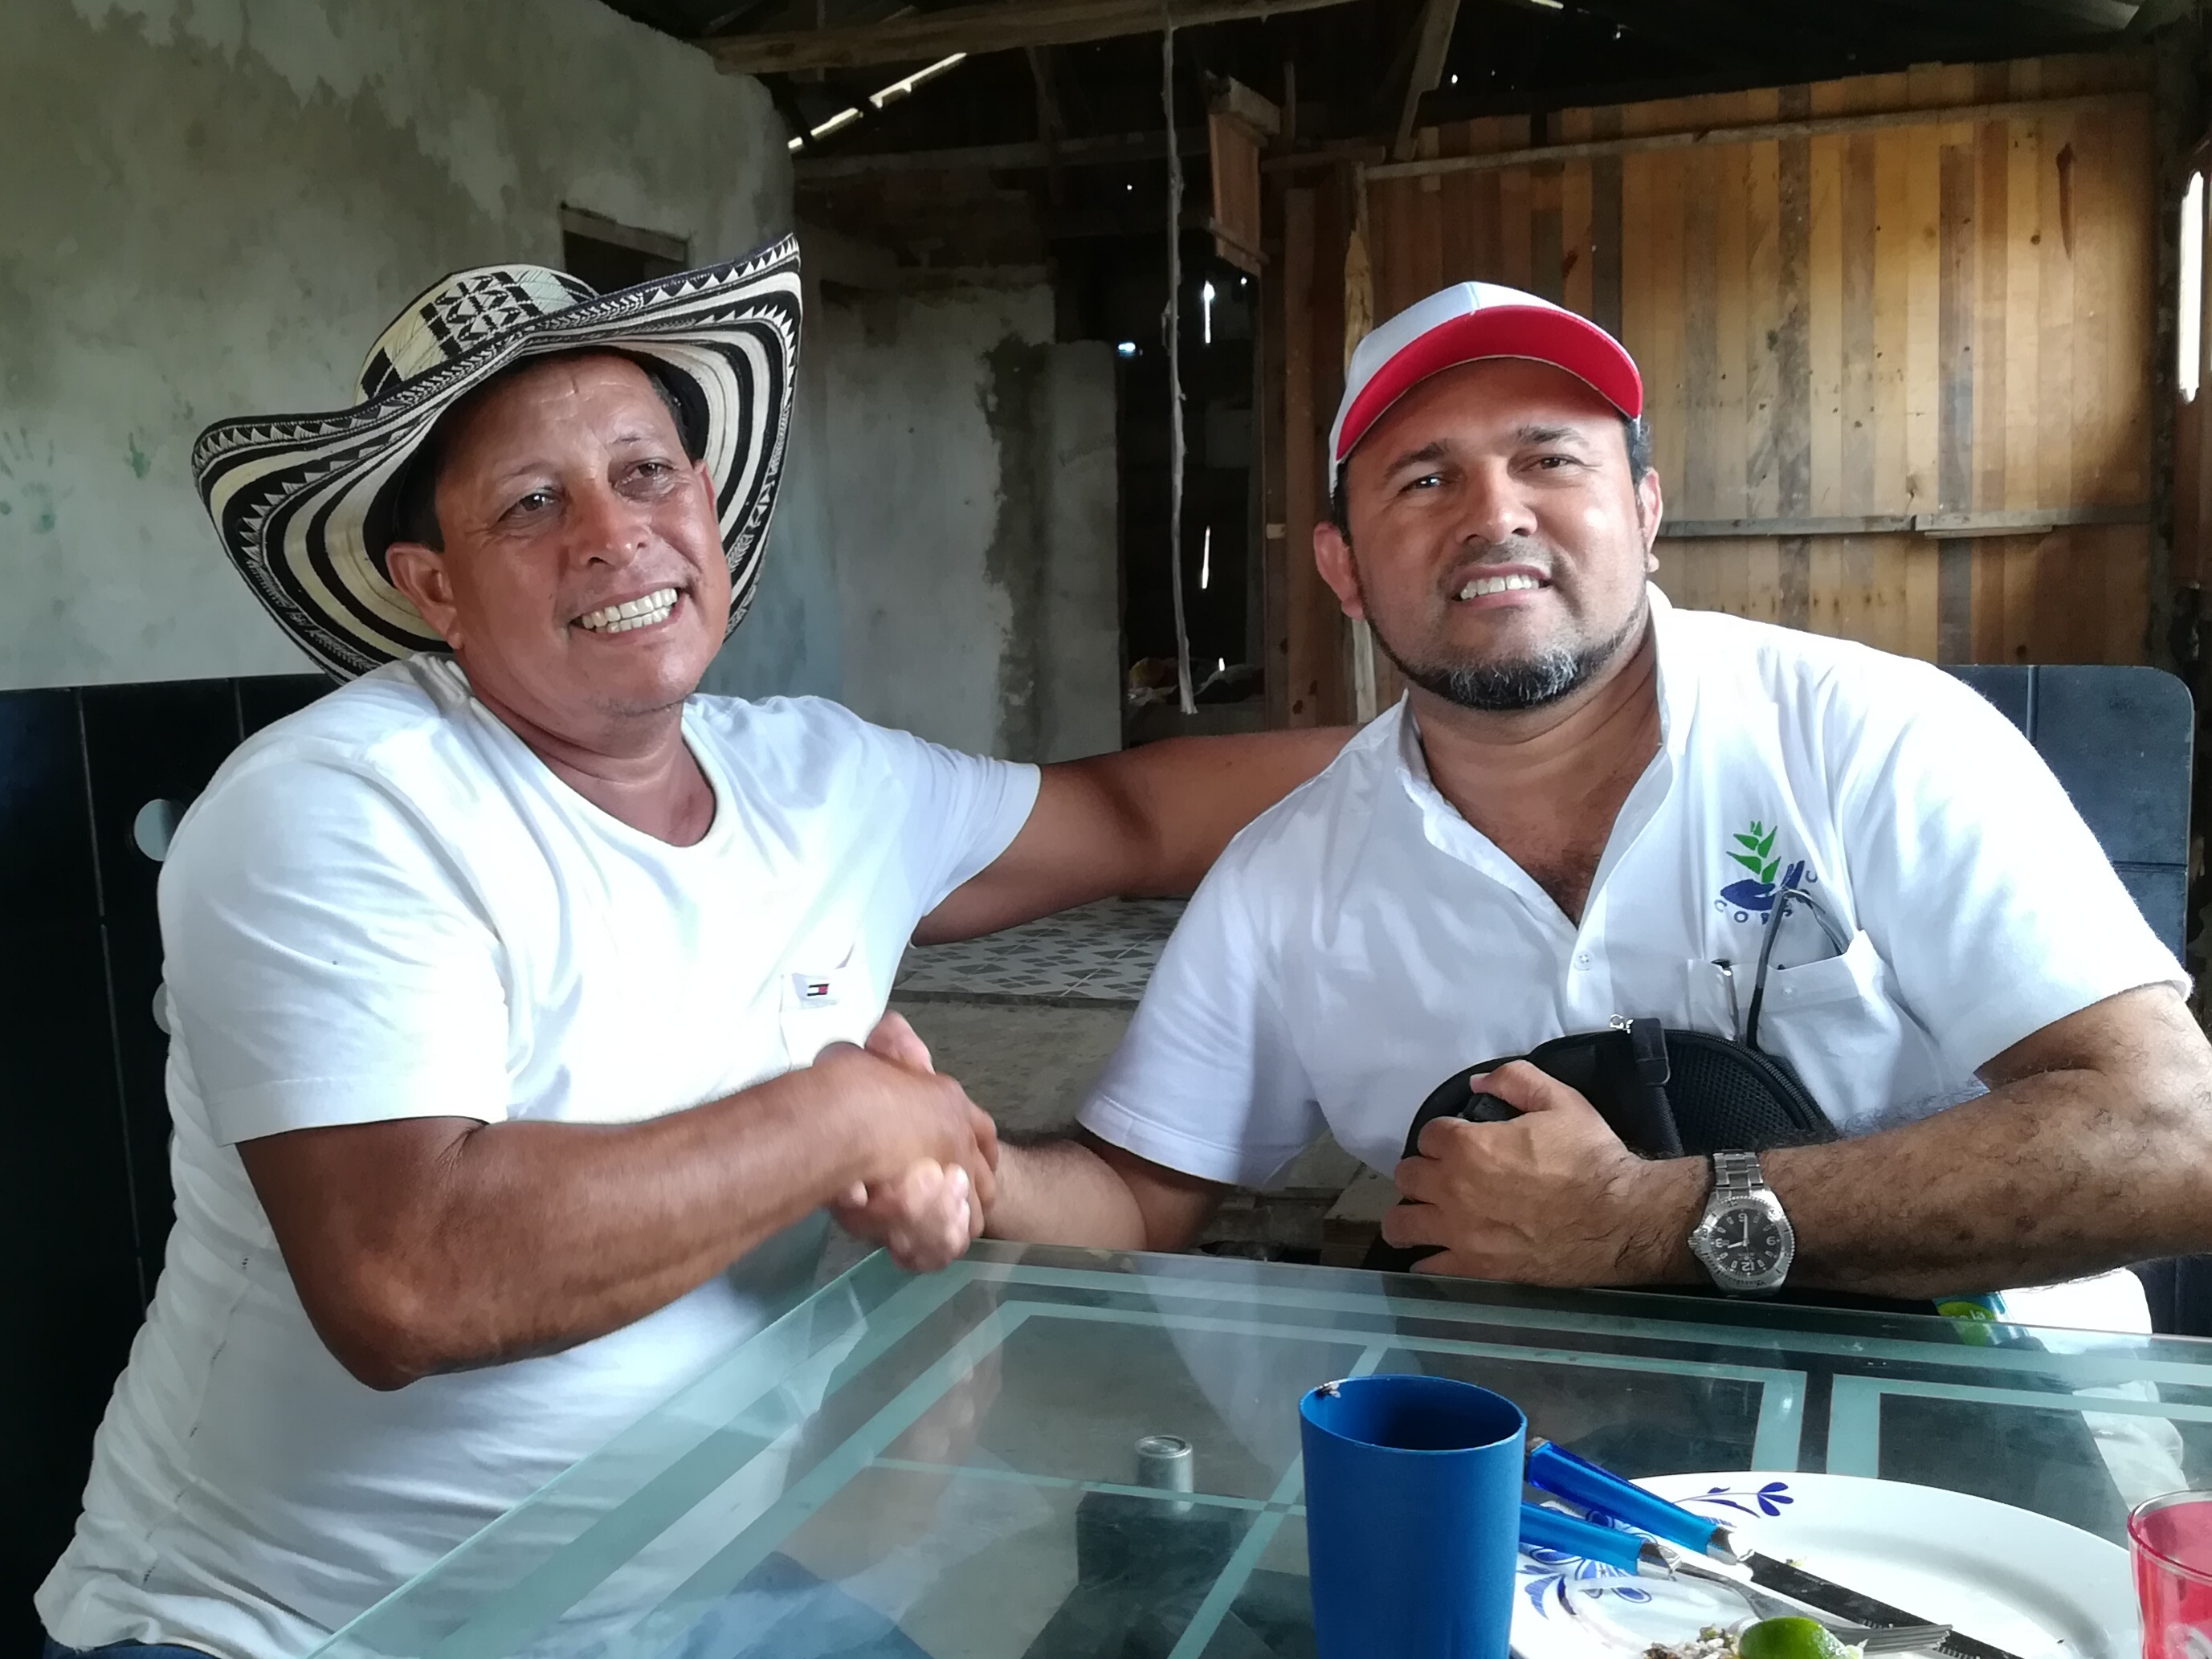 Colombia_Michael_Joseph_Nueva_Venecia_Pedro_copy.jpeg